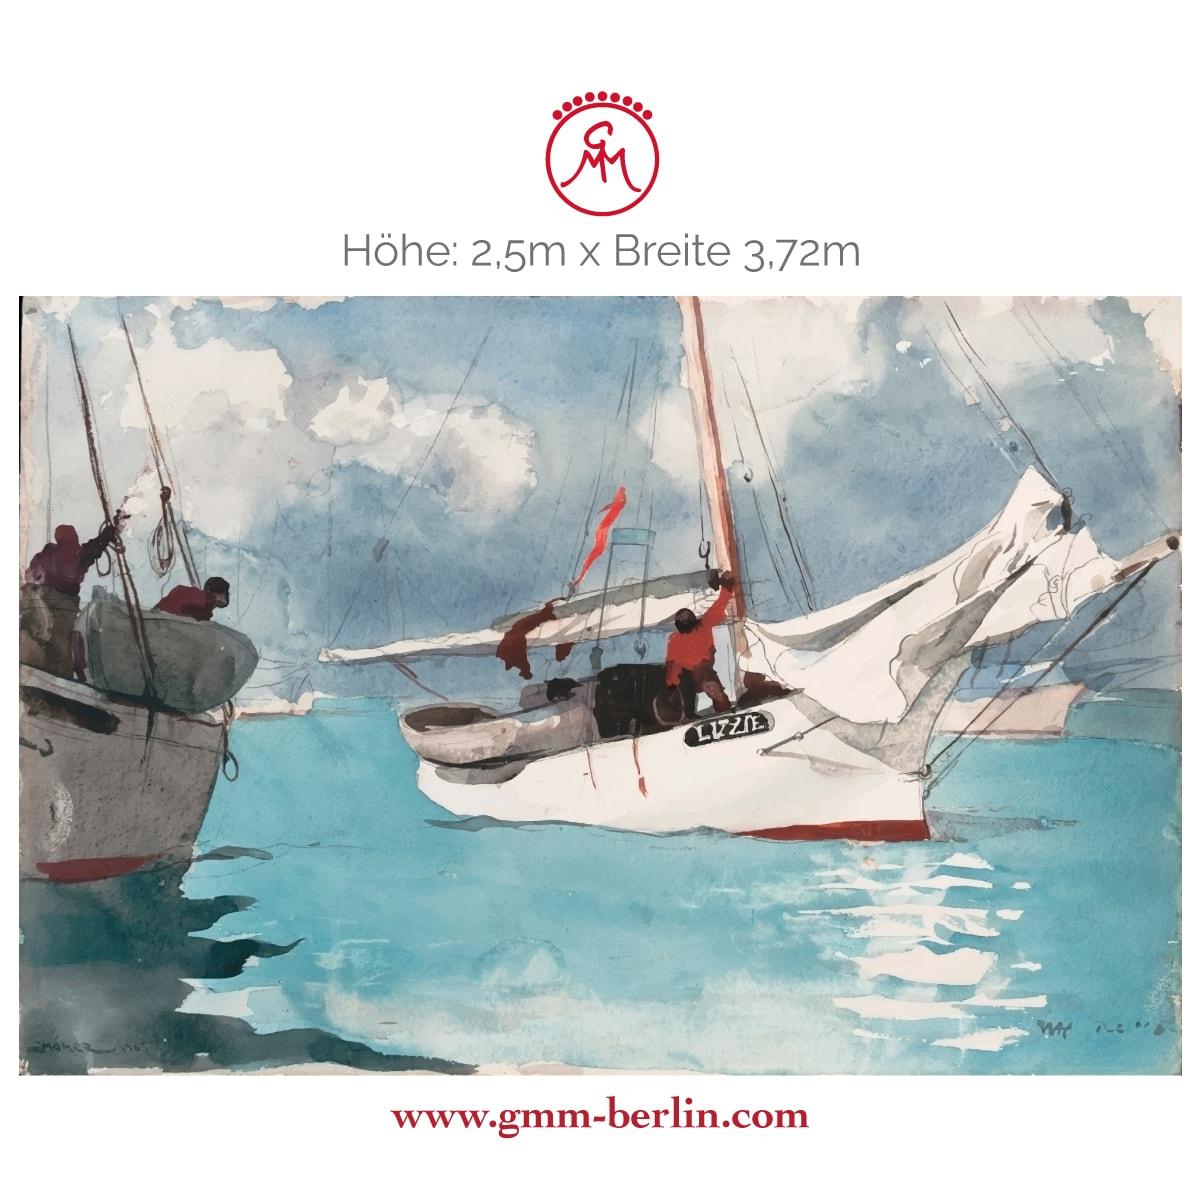 "Exkusive Panoramatapete: Maritime Kunst Tapete ""Fischer Boote, Key West"" nach Winslow Homer"